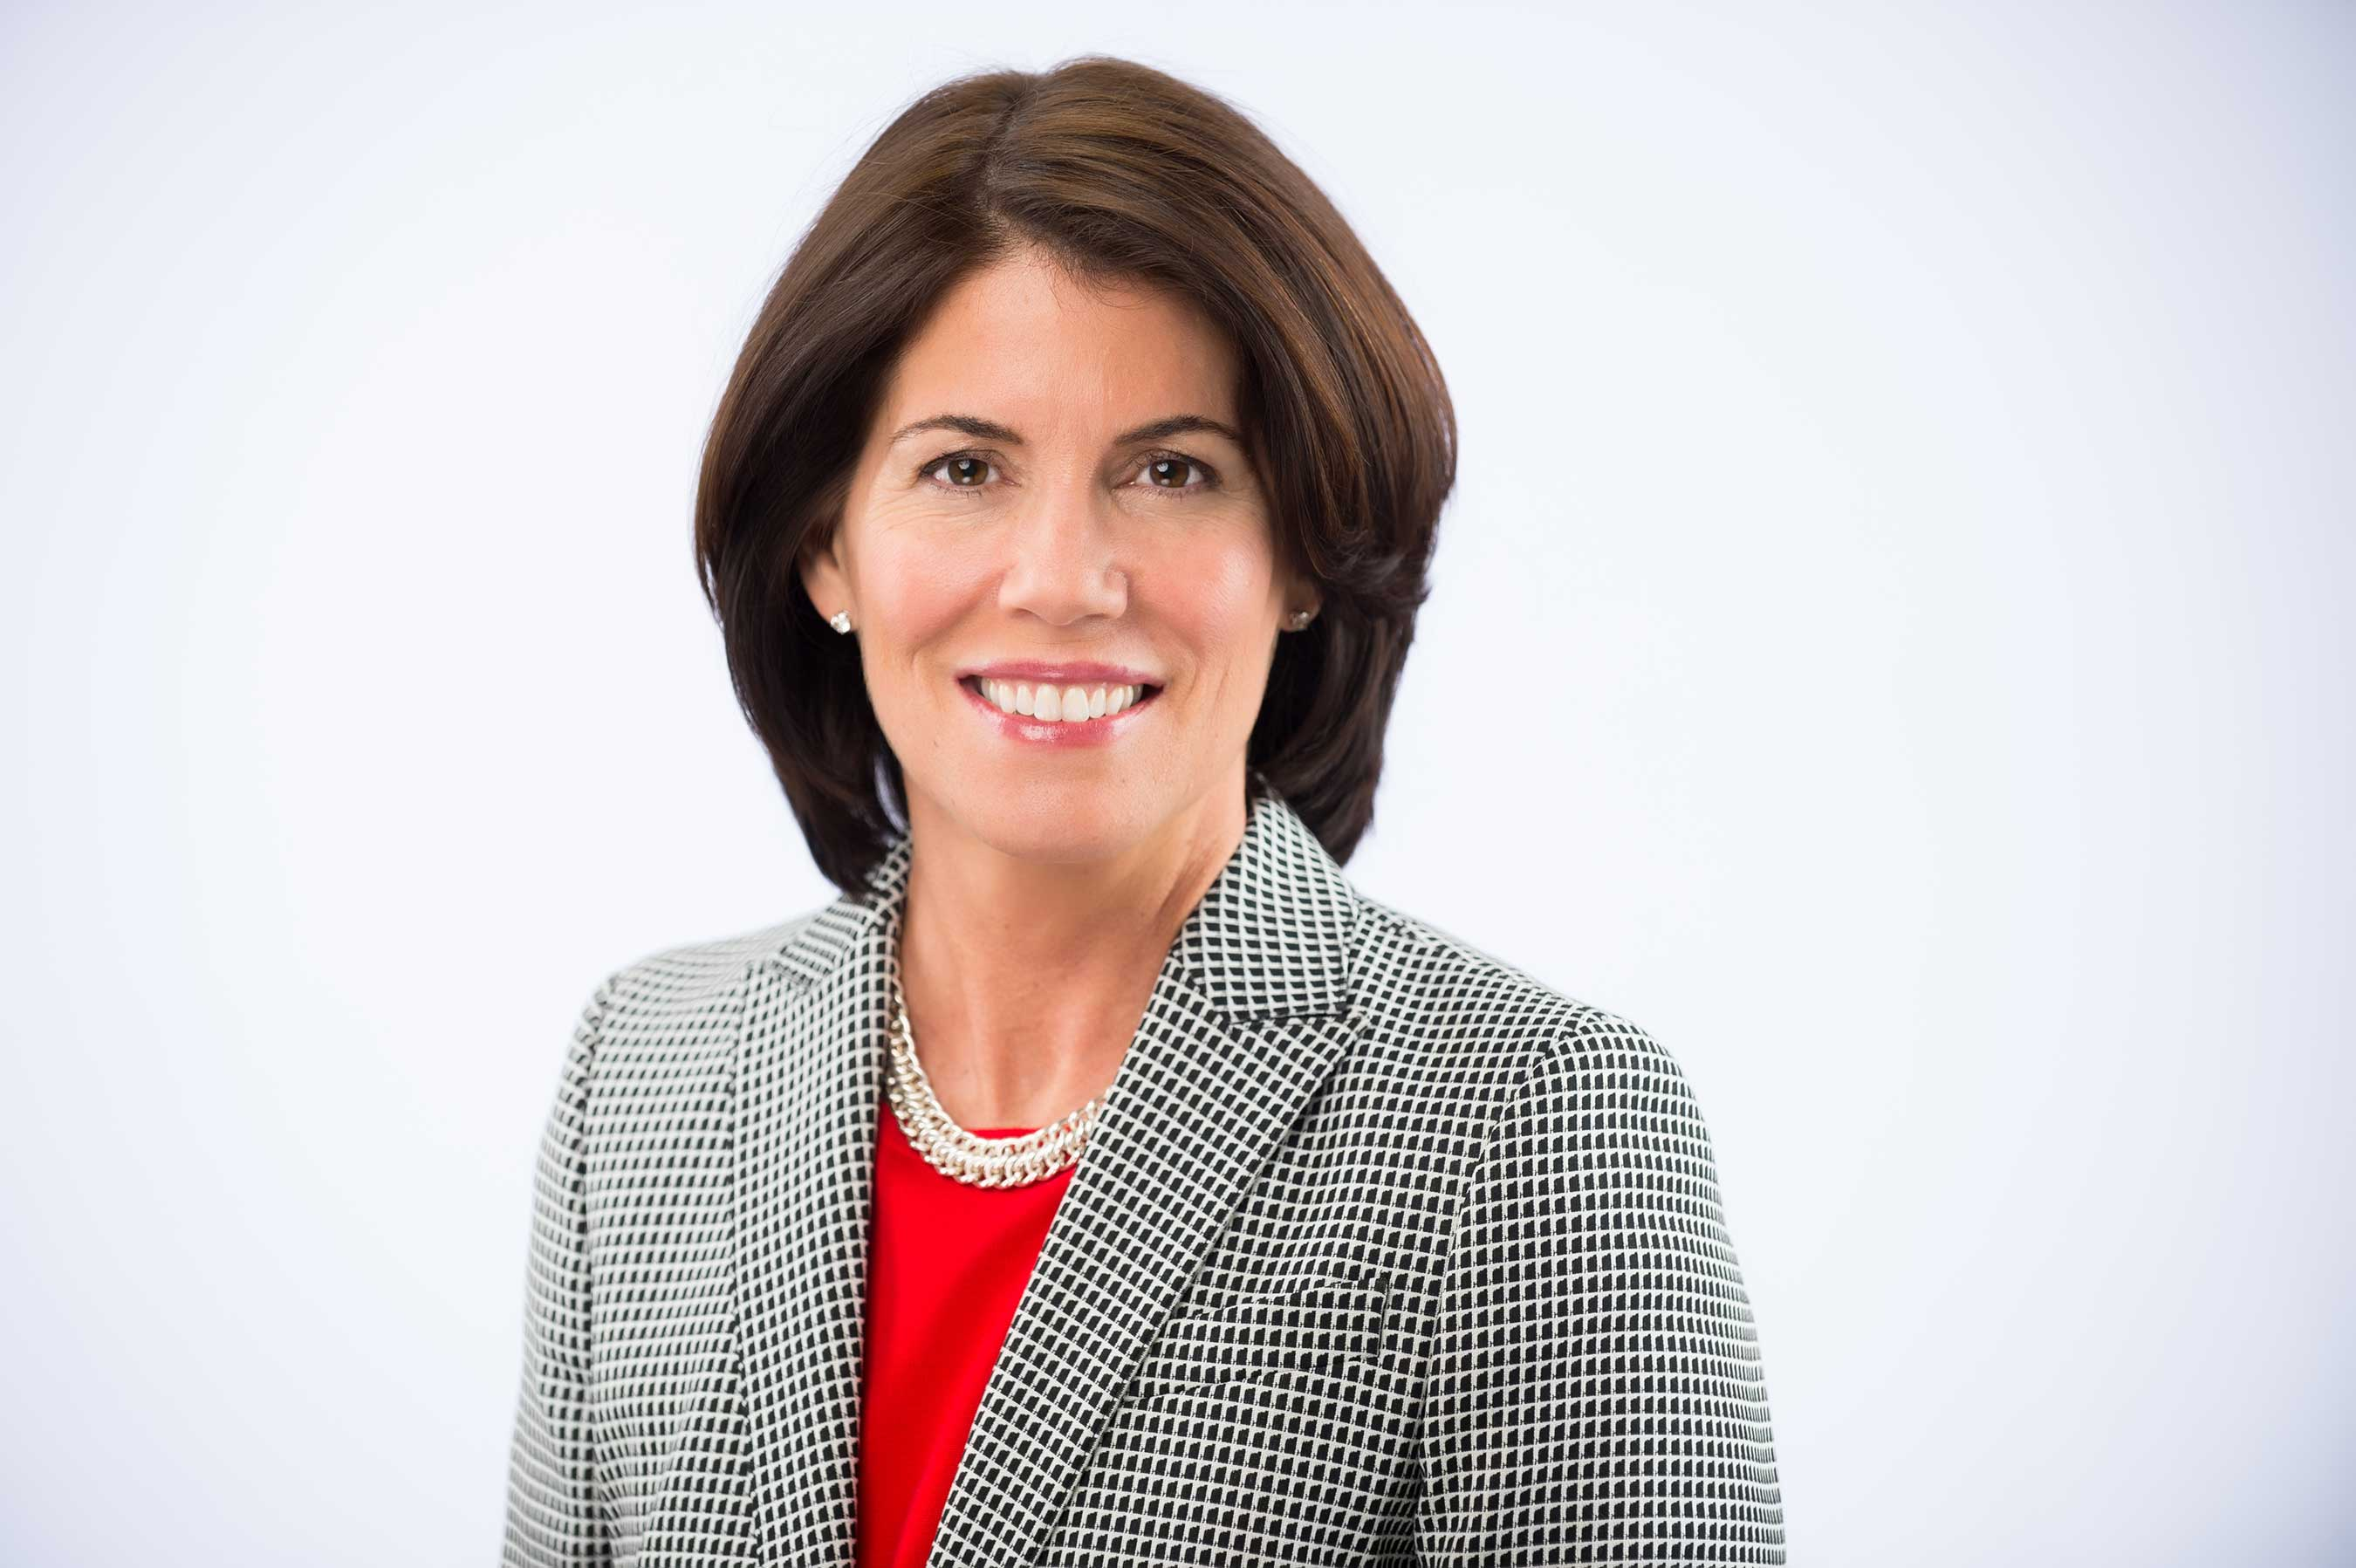 Headshot of Helena Foulkes, President, CVS Pharmacy